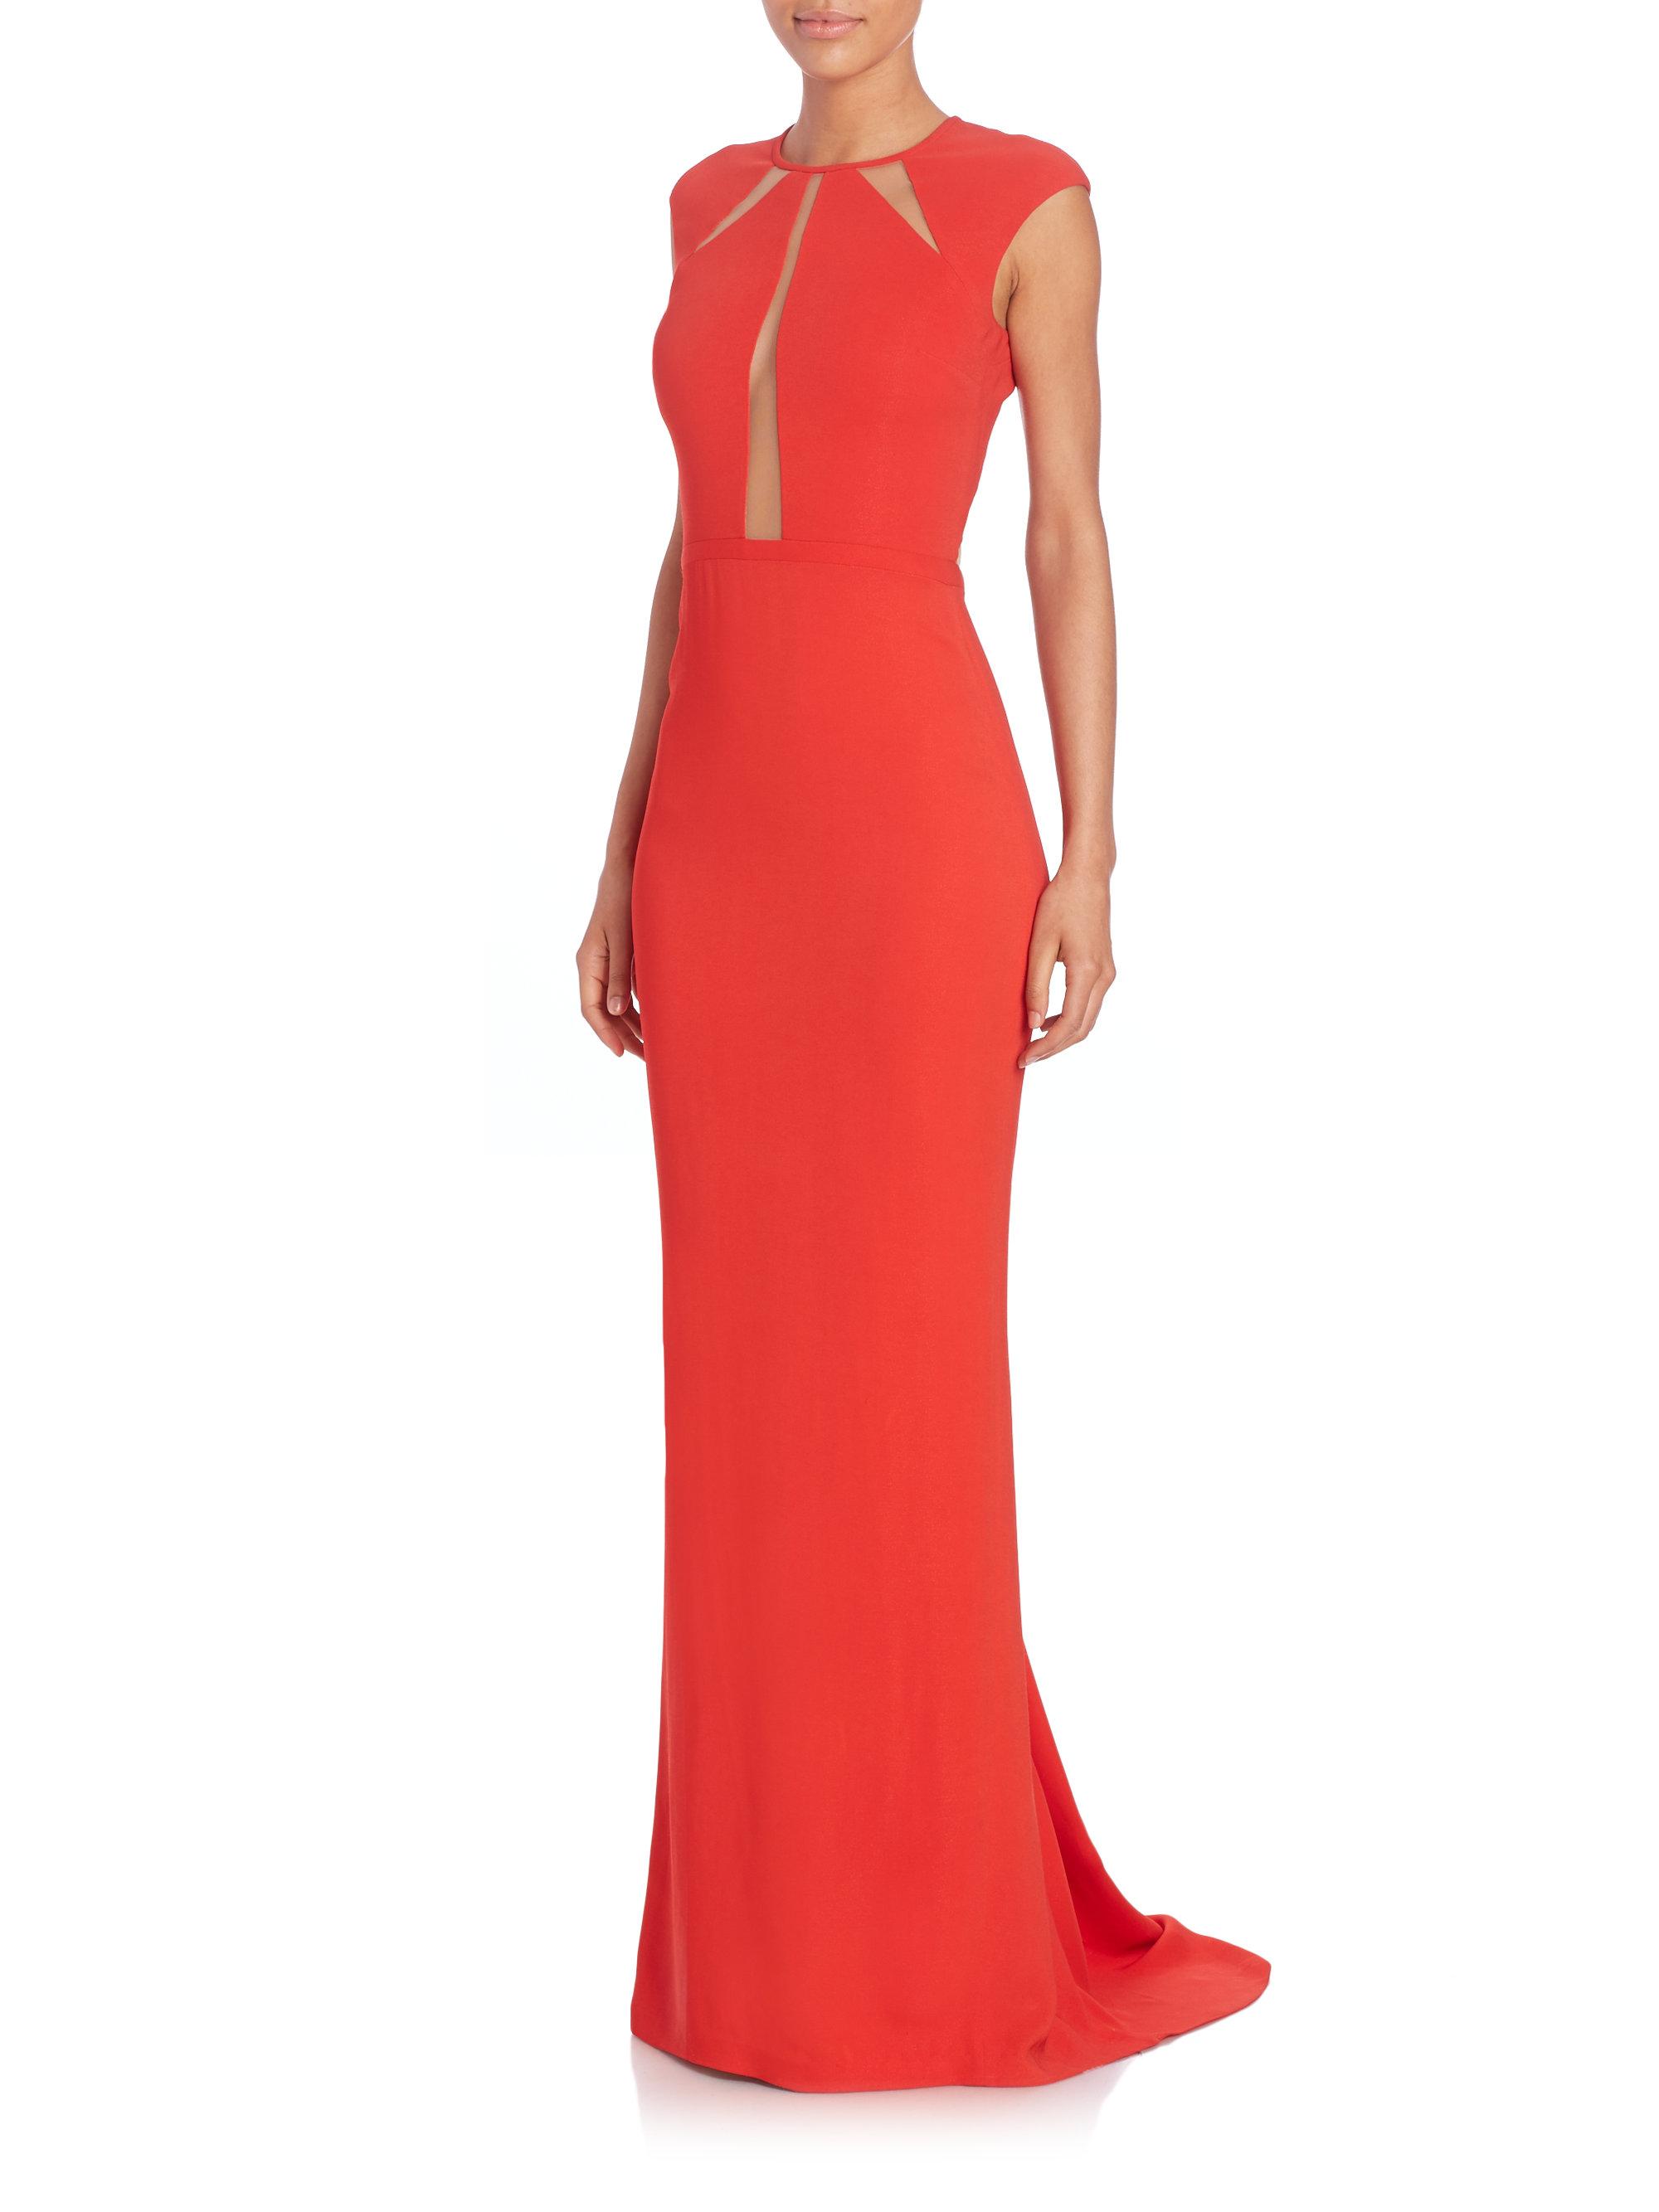 Lyst - Michael Kors Illusion-inset Gown in Orange